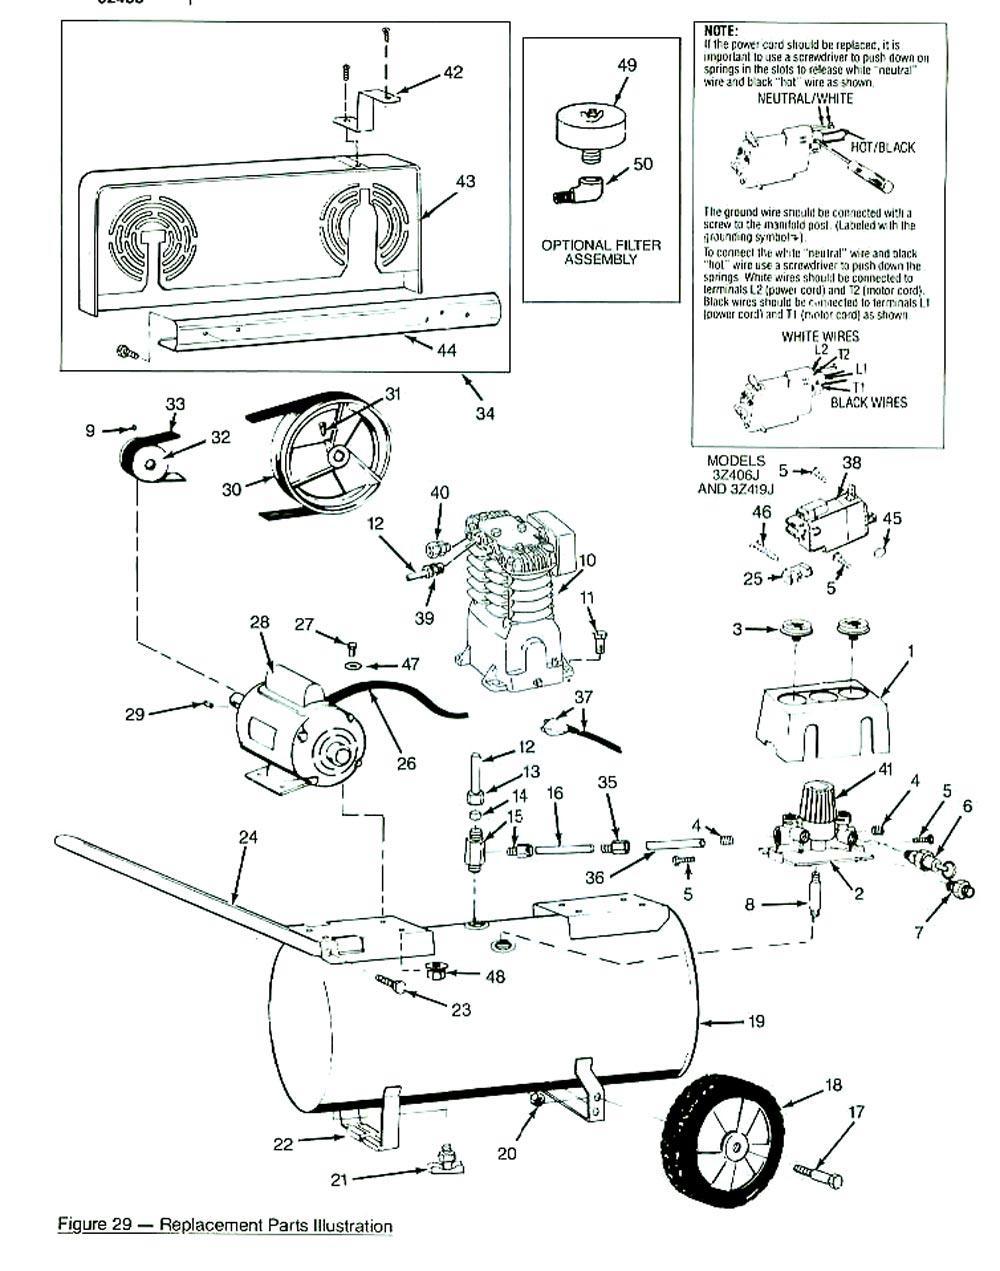 Air Compressor Pumps Speedaire Compressors Schematic 3z355j